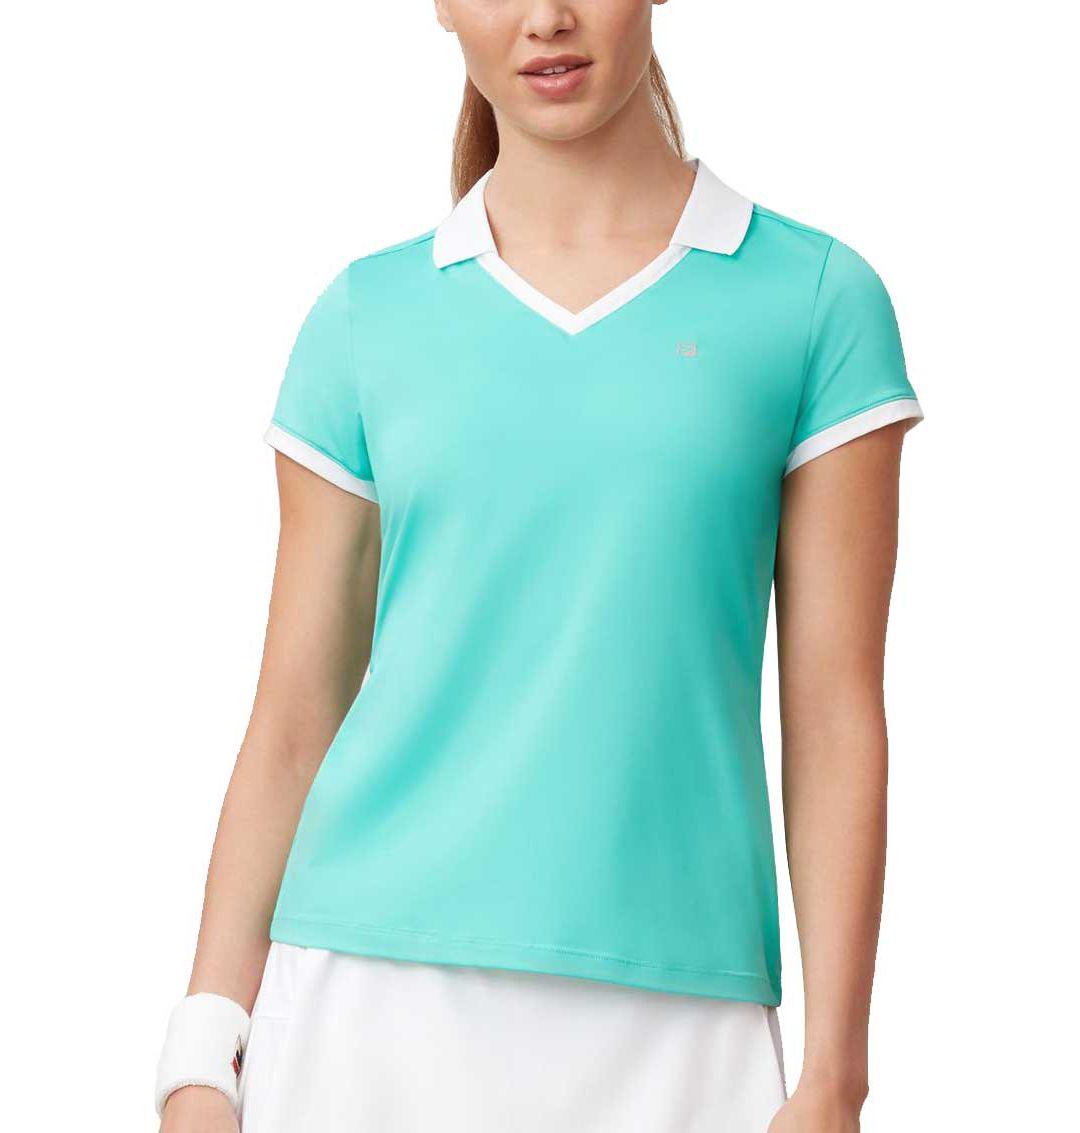 reputable site 1732f 7ee09 Fila Women's Windowpane V-Neck Tennis Shirt